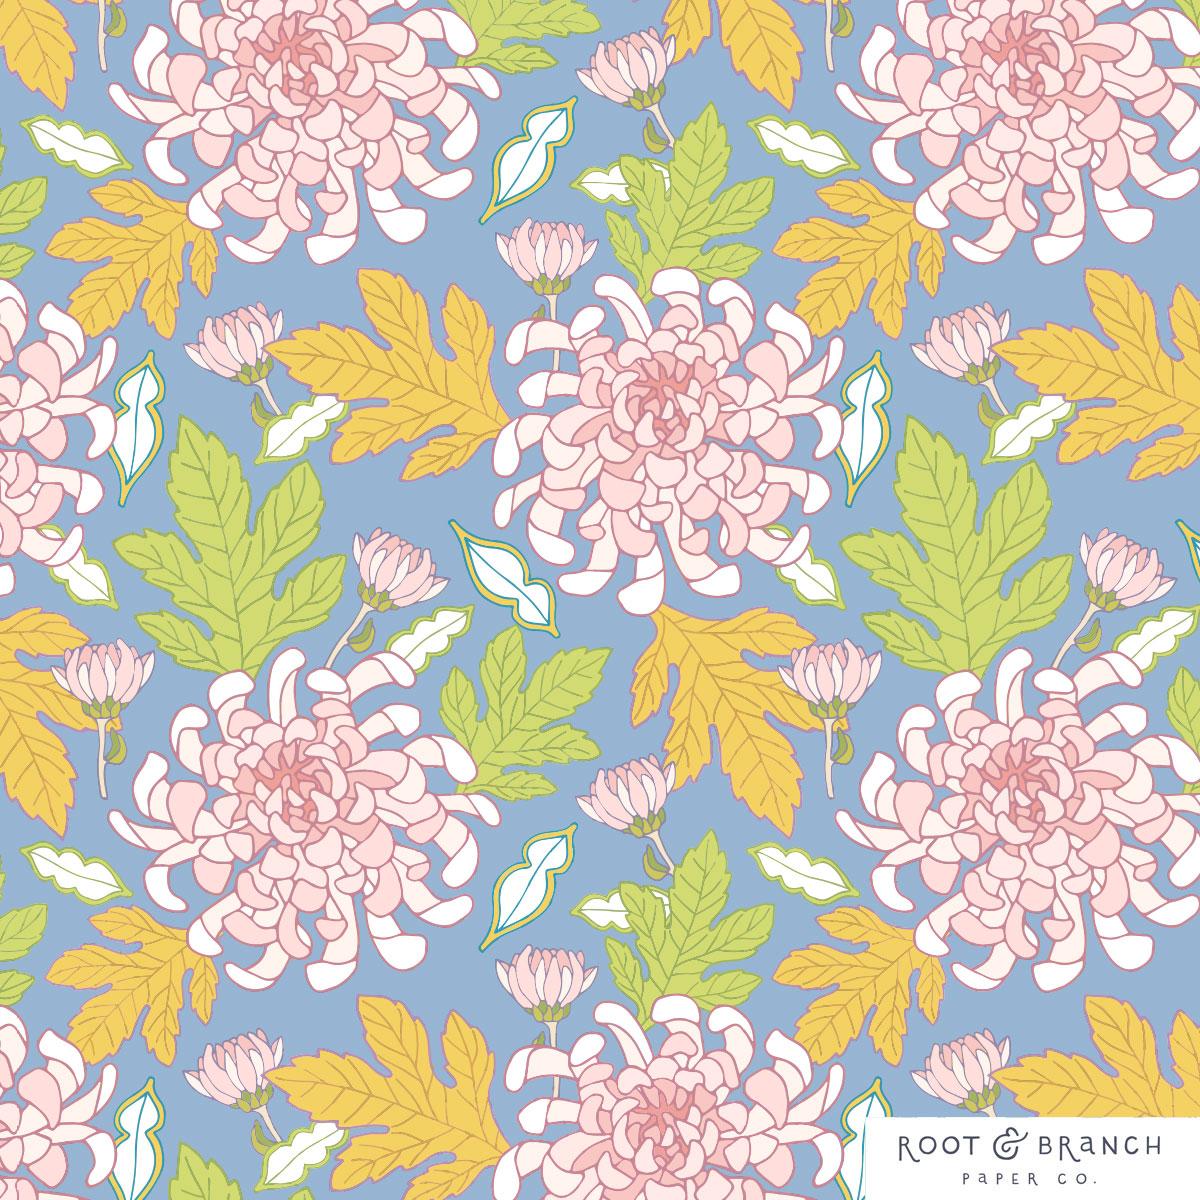 chrysanthemum-instagram.jpg